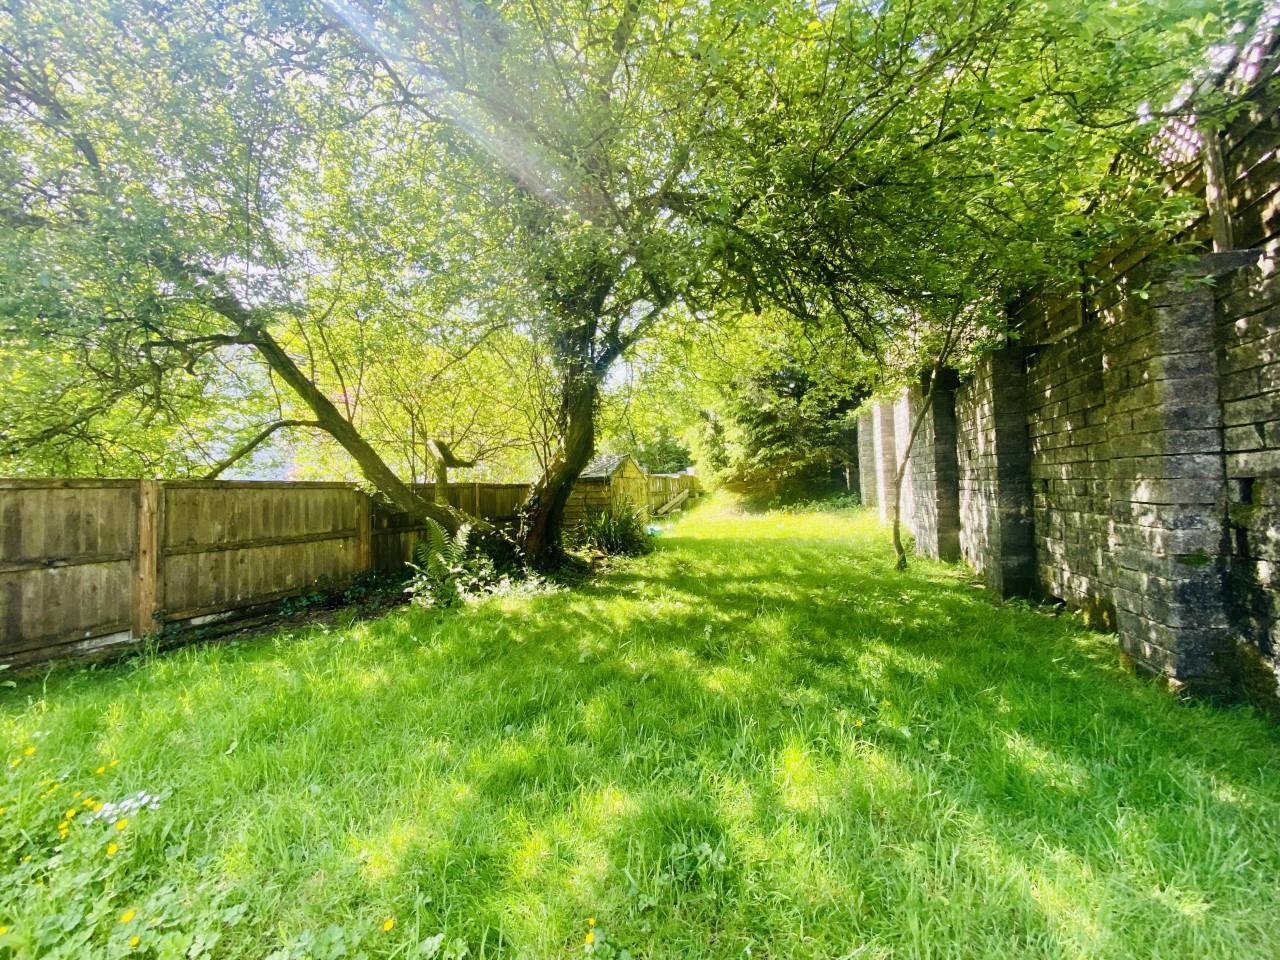 Underhill House, Dunvant Square Dunvant, Swansea, SA2 7TA